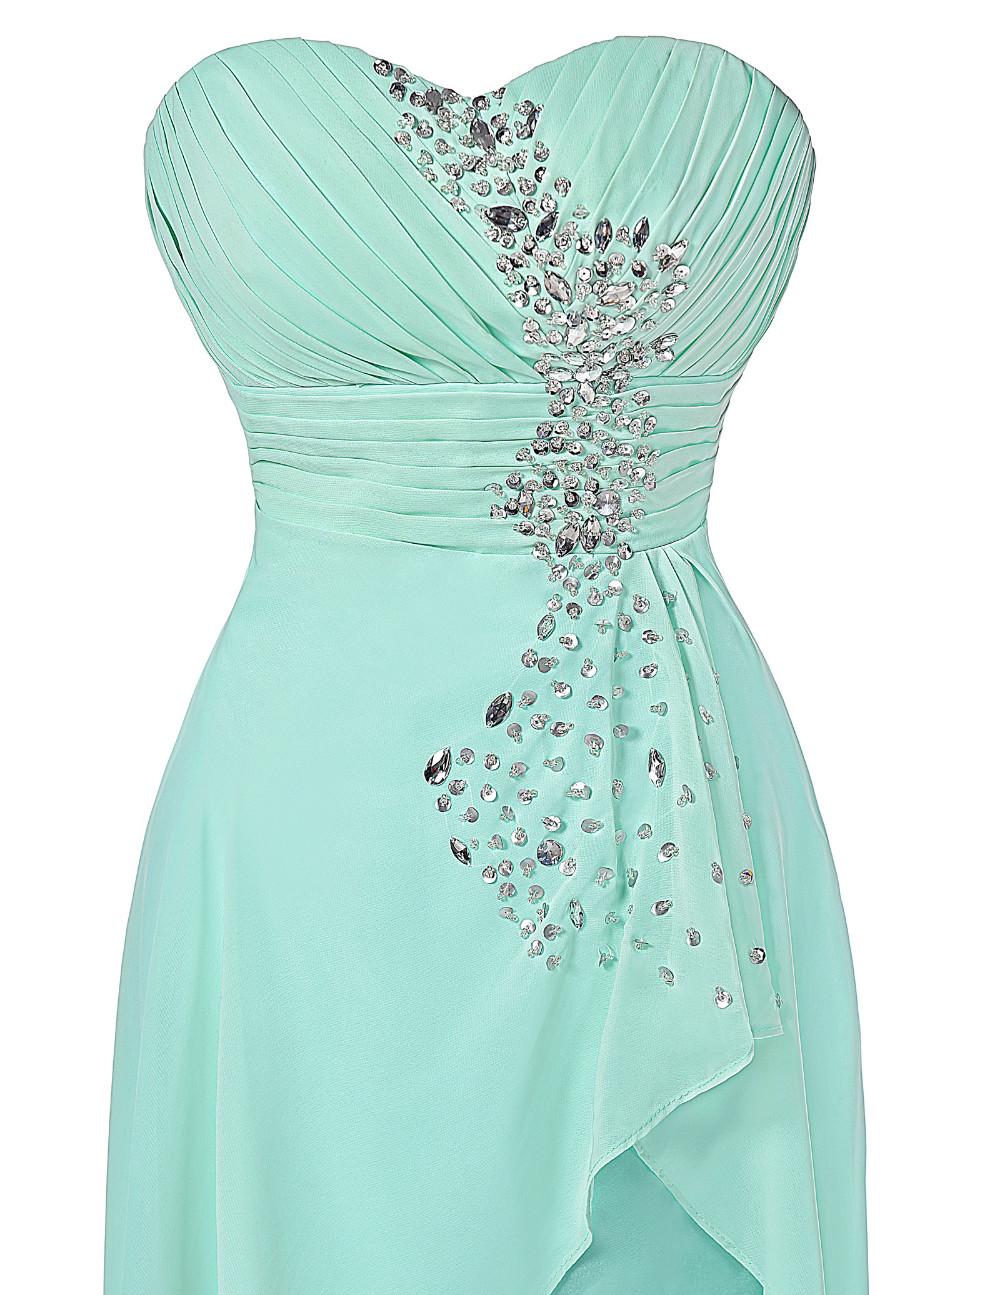 HTB1MKY1KVXXXXcmXFXXq6xXFXXX8High Low Short Front Long Back Strapless Dress